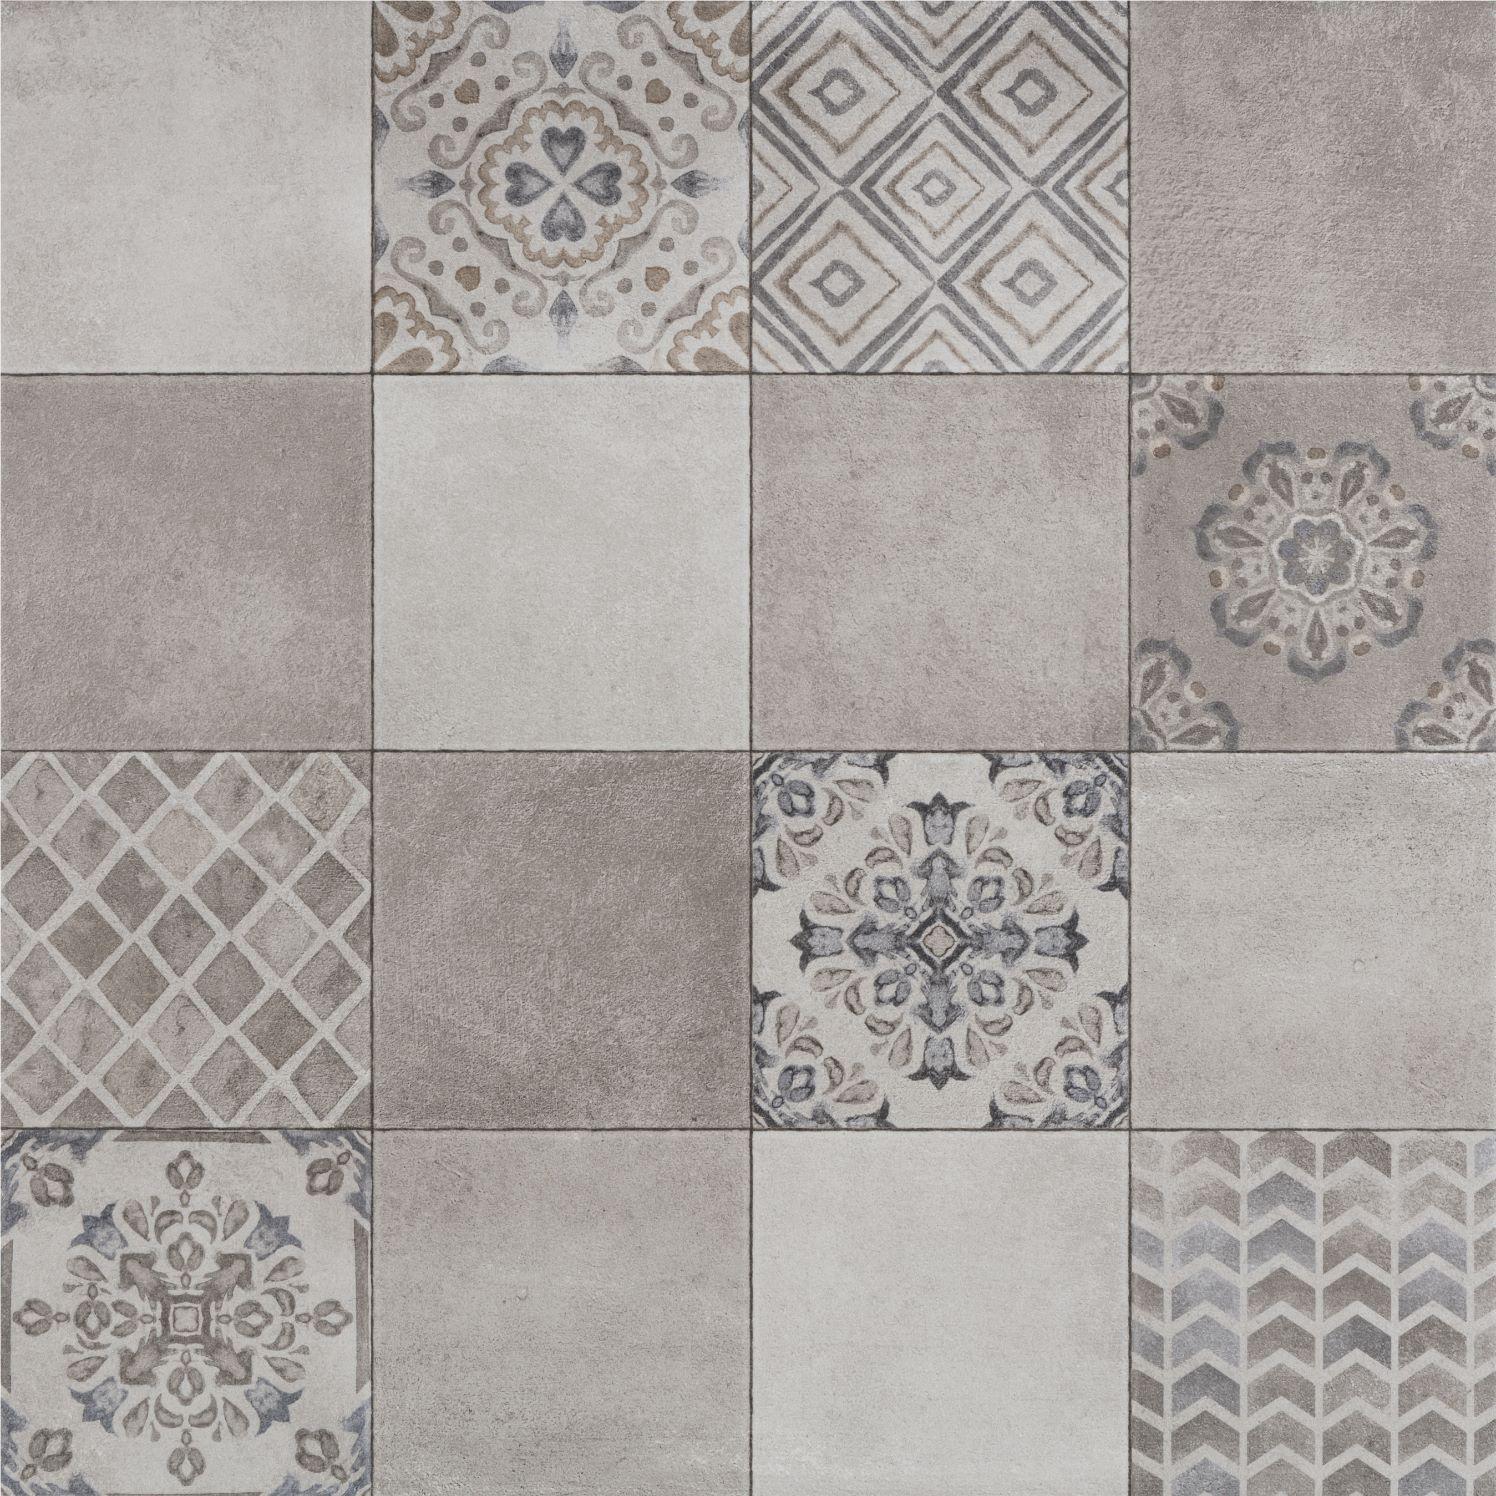 Azuliber decor clarence gris 65*65cm | patchwork tegel in grijs tinten.